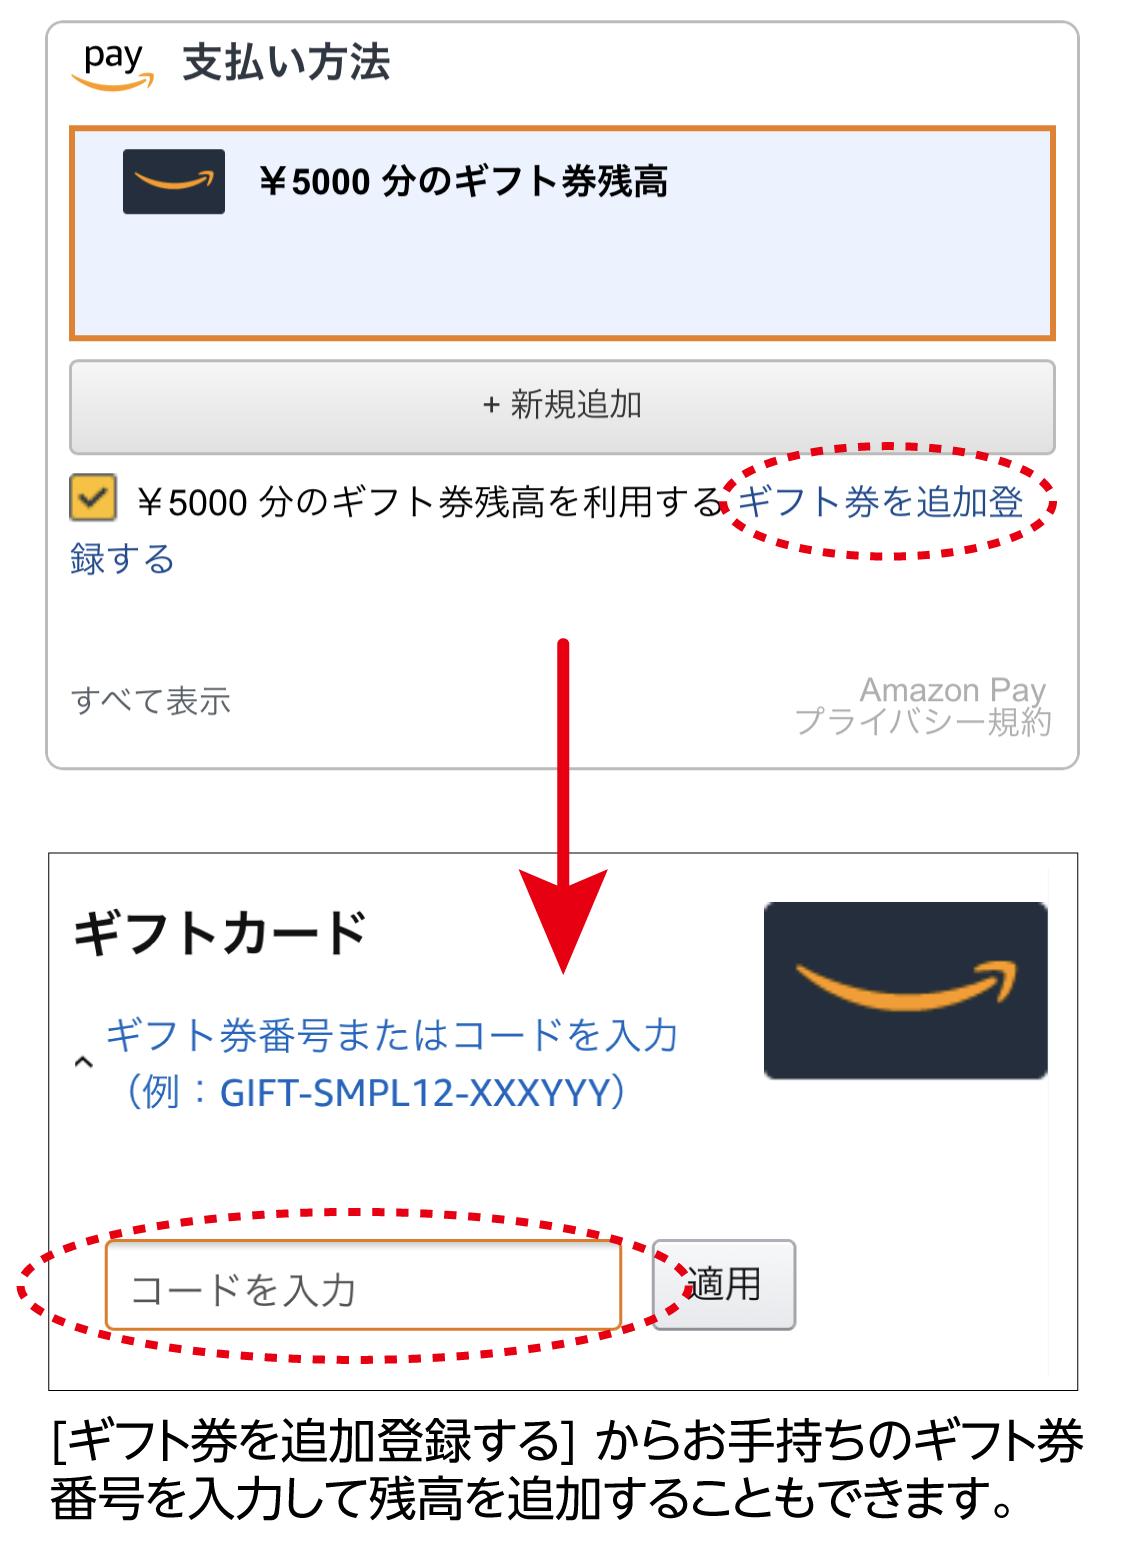 AmazonPayギフトカード入力イメージ